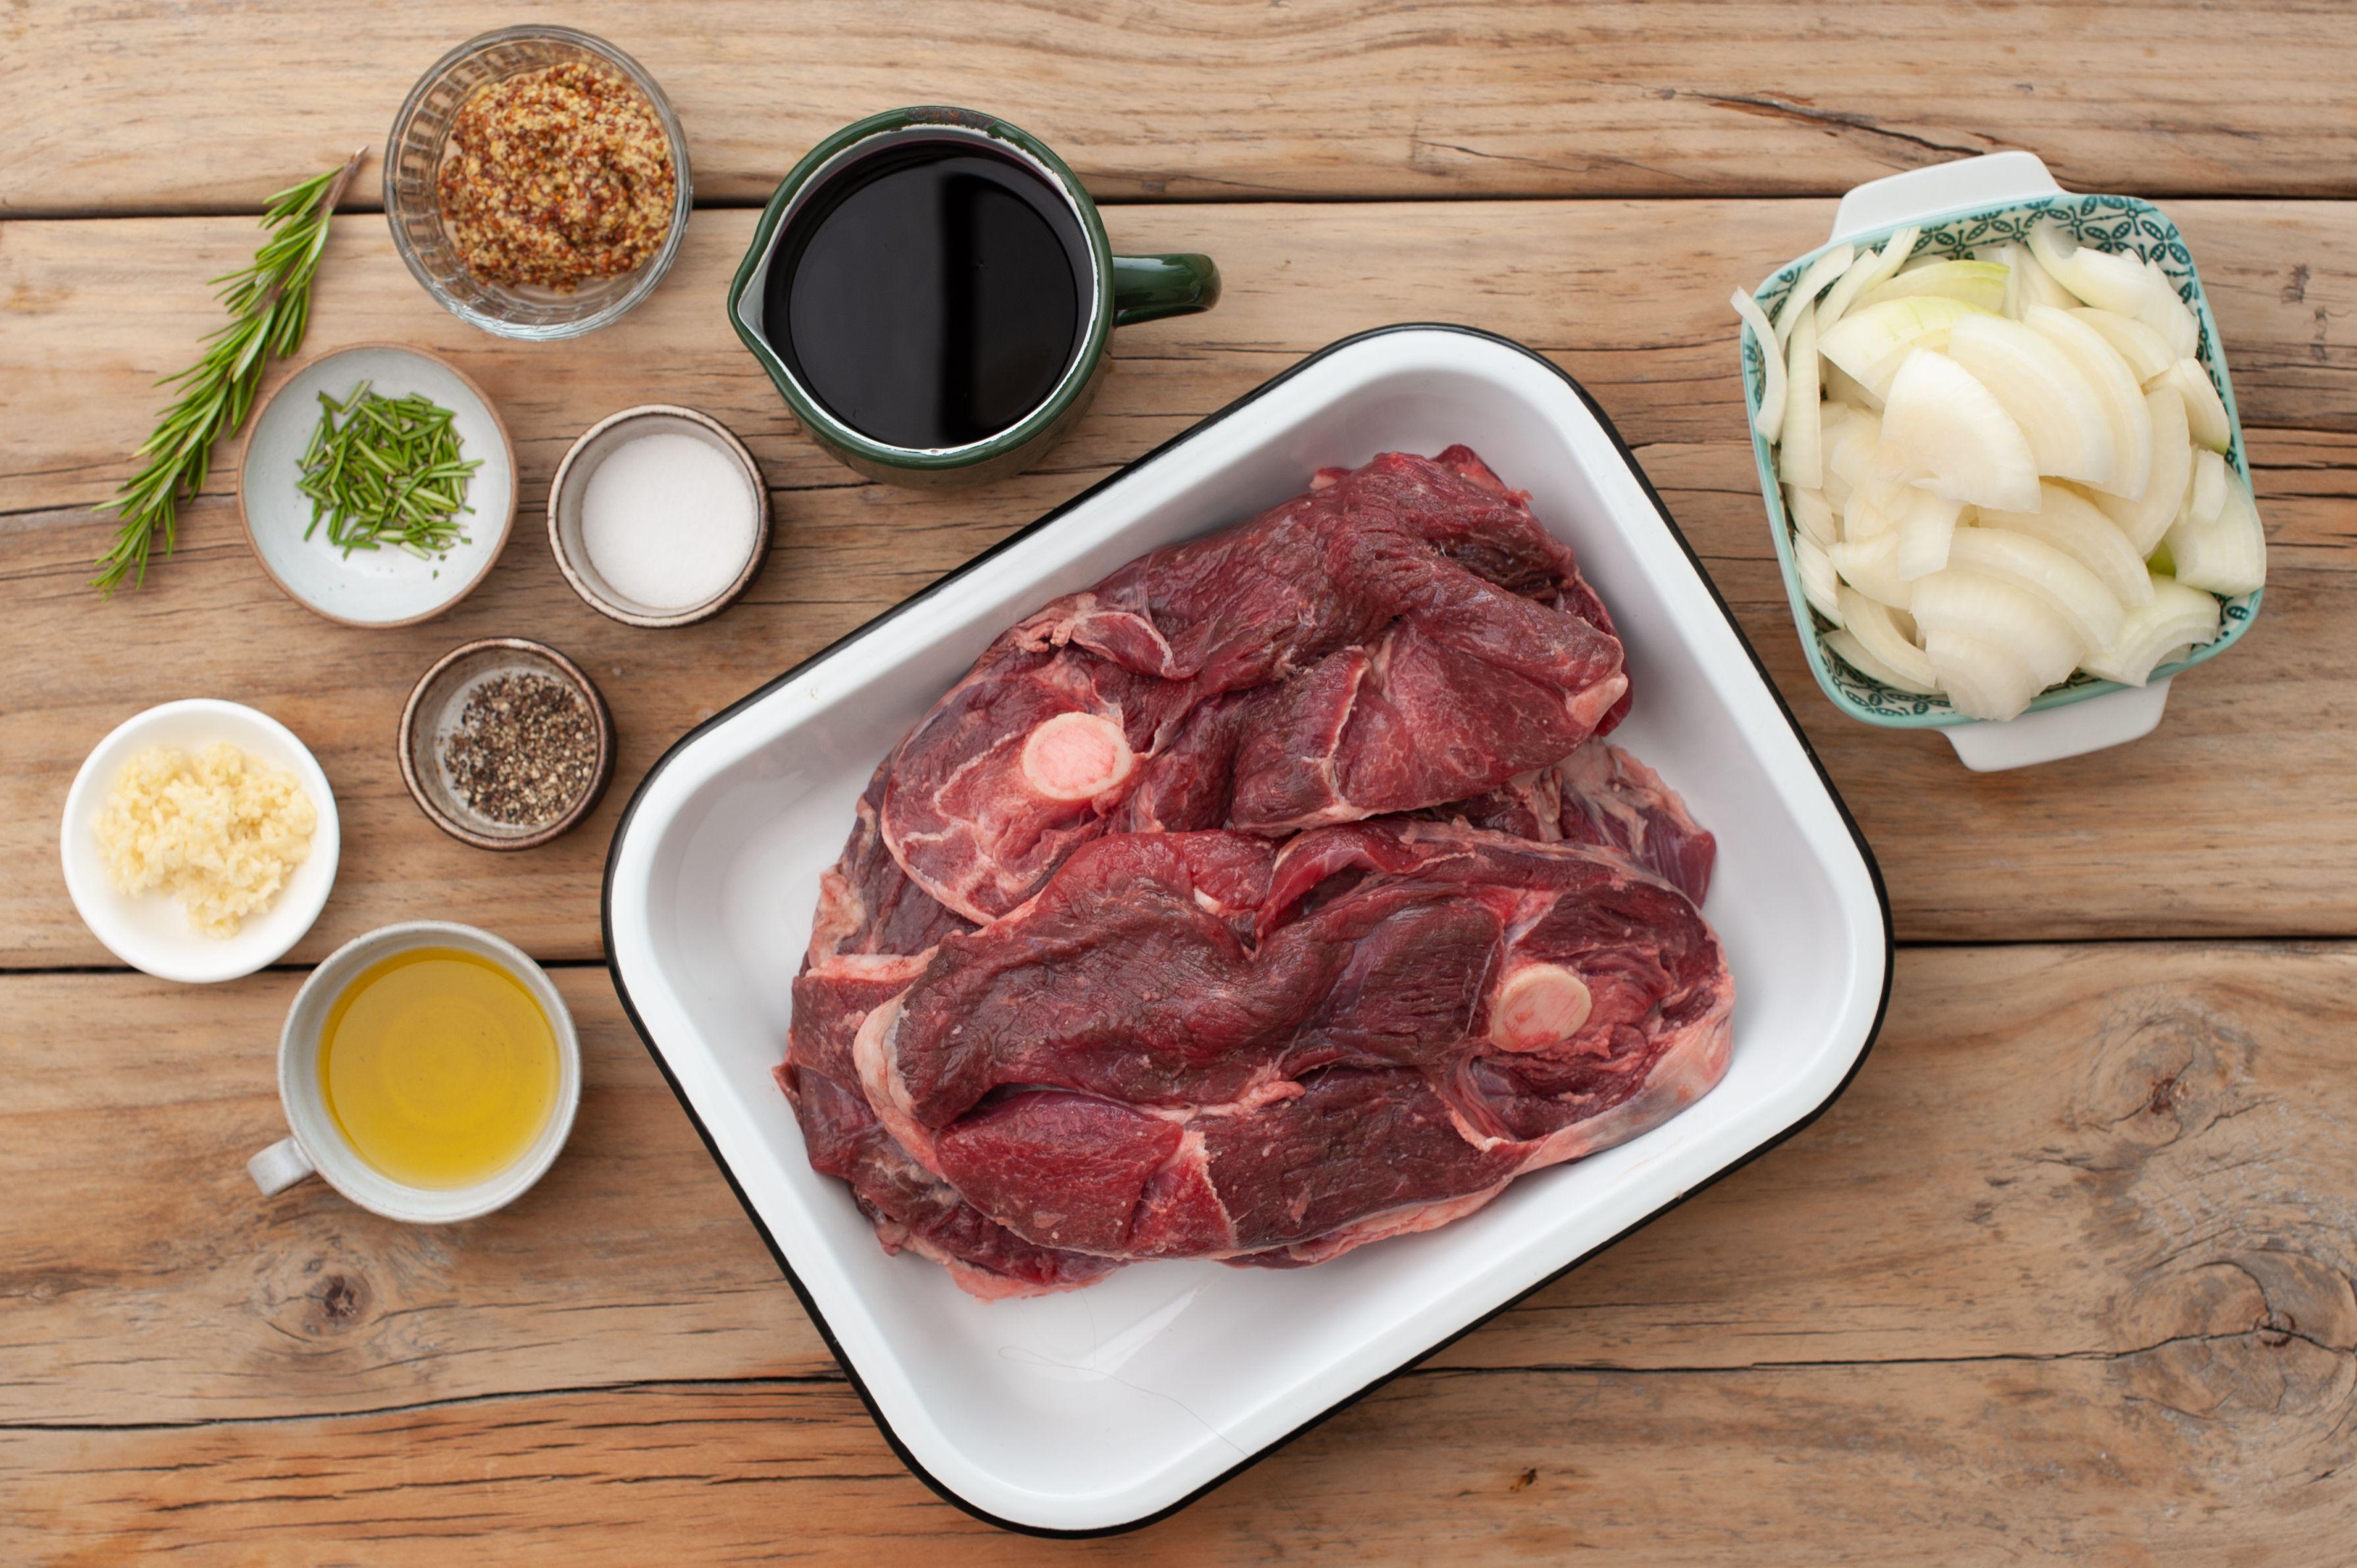 Ingredients for braised lamb shoulder chops